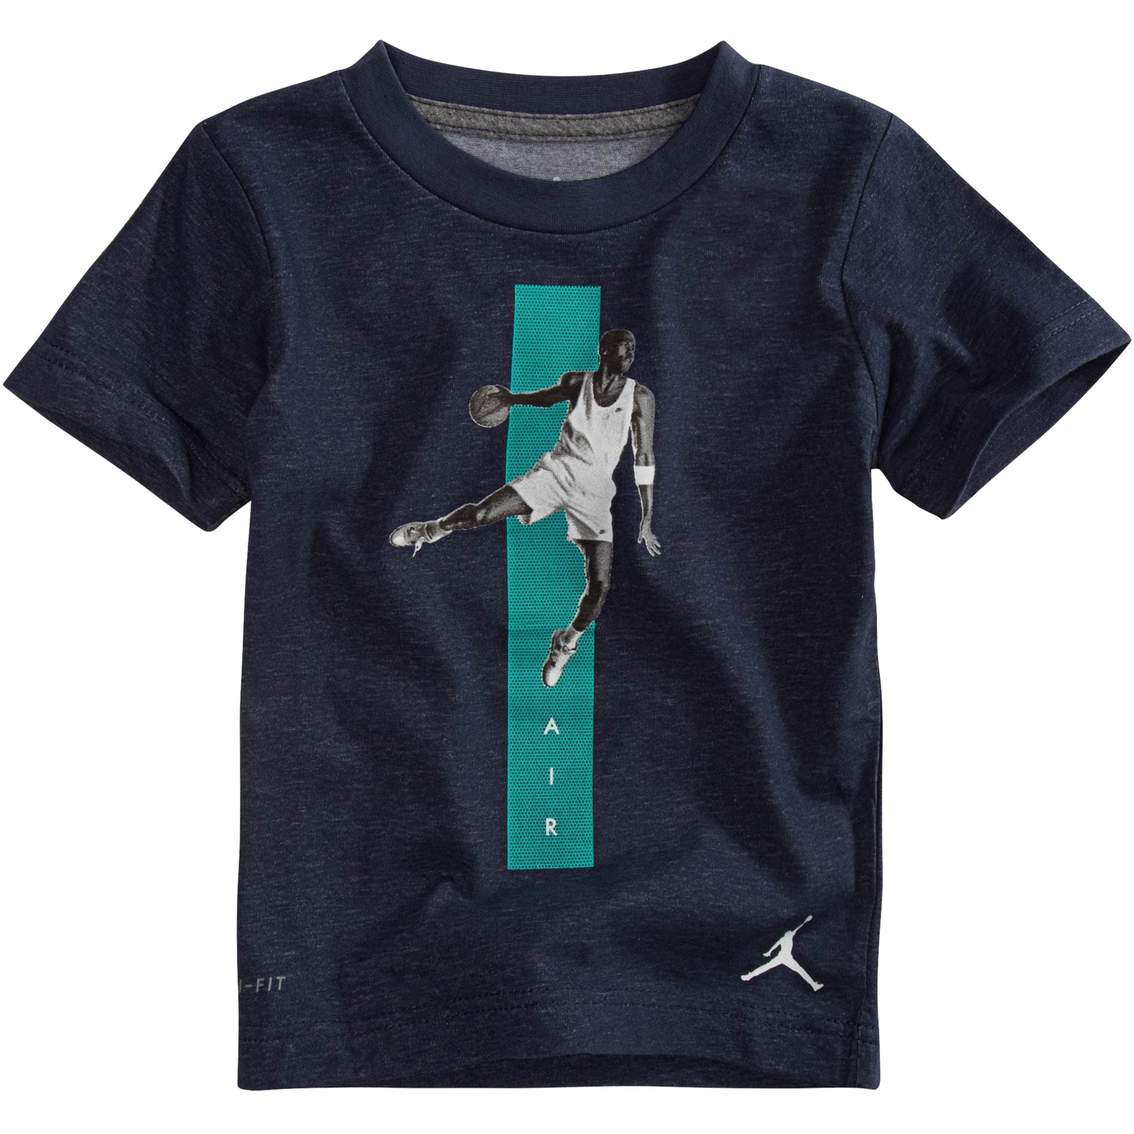 06ca7c4db1f6 Jordan Toddler Boys Dri Fit Jumpman Logo Tee